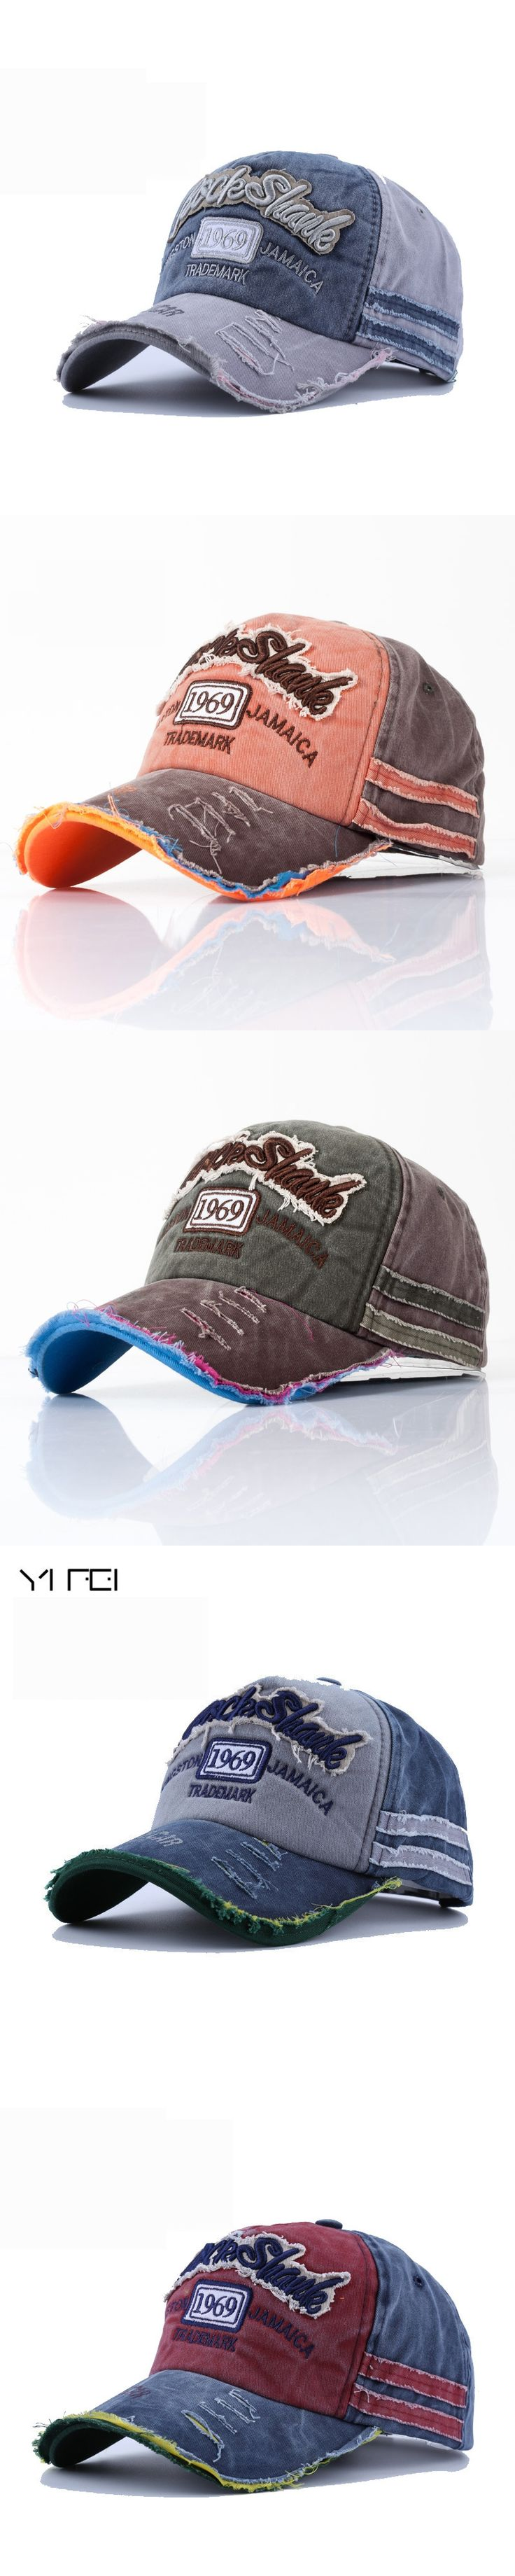 YIFEI Brand Baseball Cap Men Snapback Cap Hat Women Vintage Baseball Hat For Men Casquette Bone Sports Cap Sun Hat Gorras